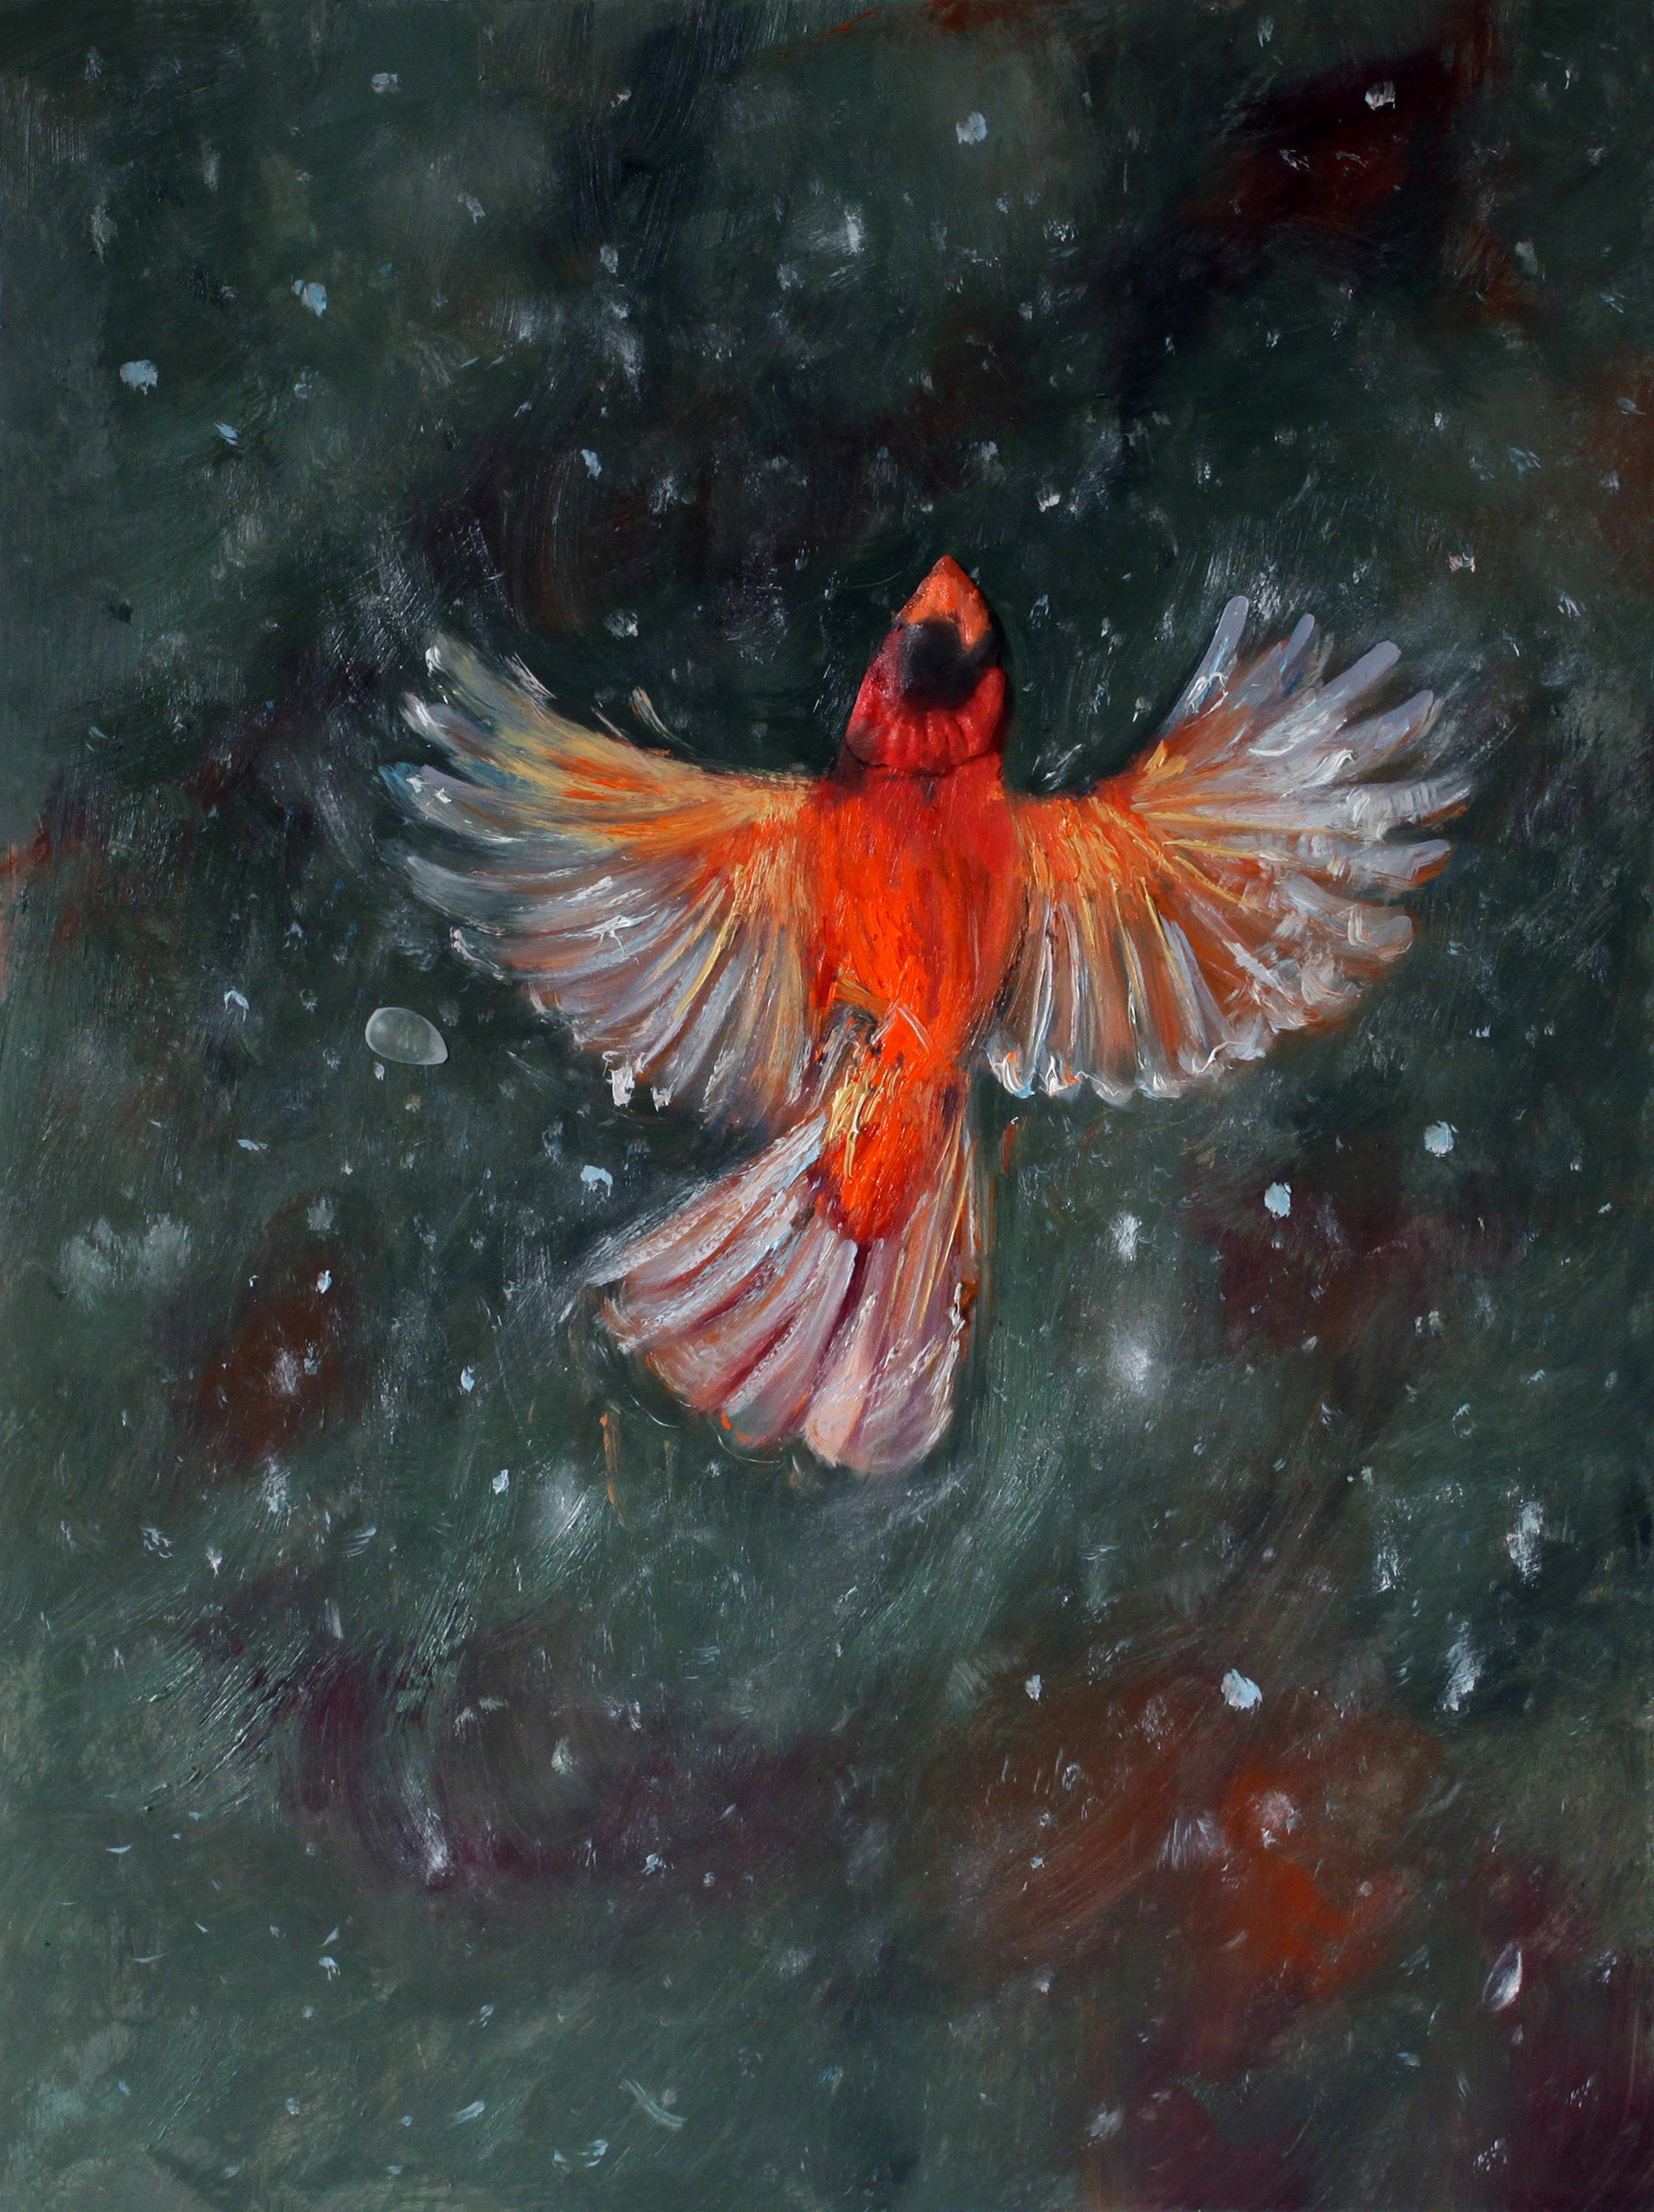 GUIDO SALIMBENI, Red Cardinal Flying Up